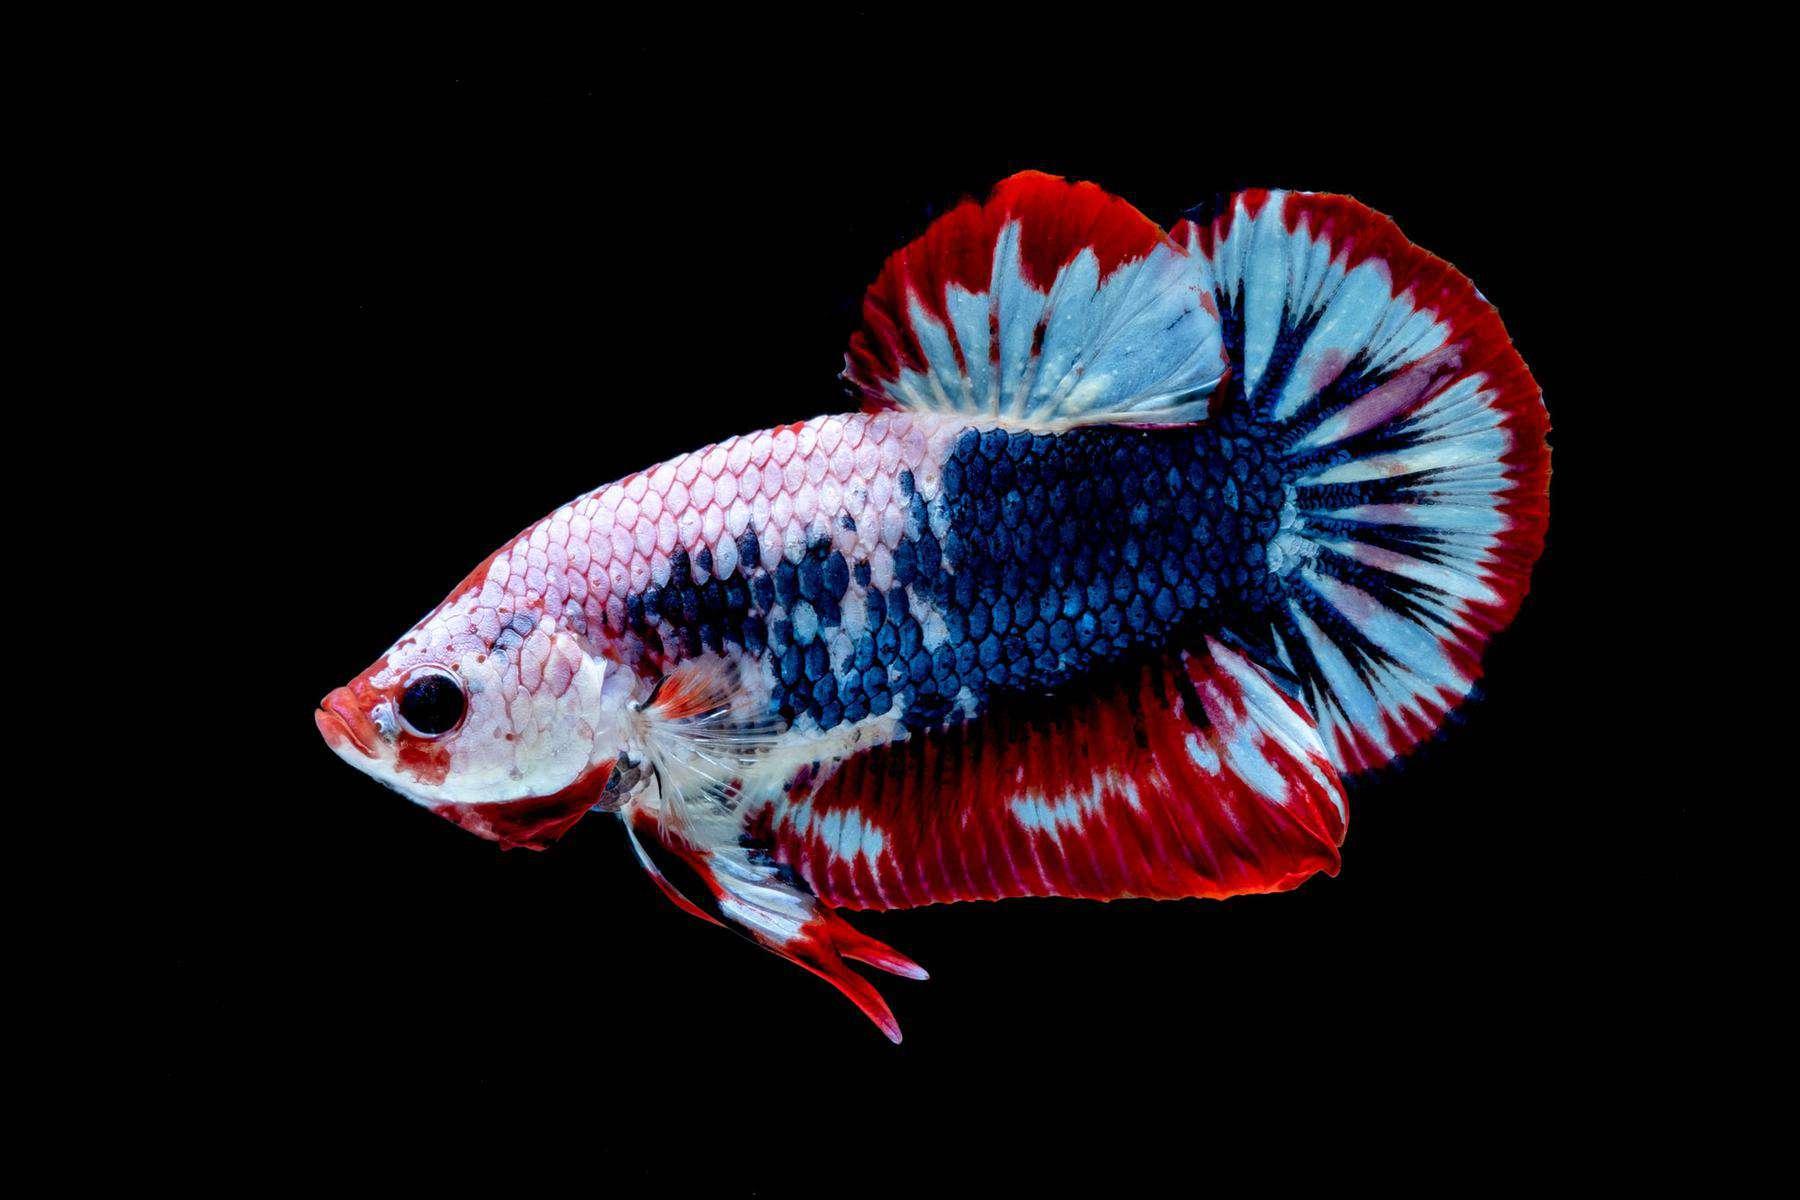 betta fish with columnaris